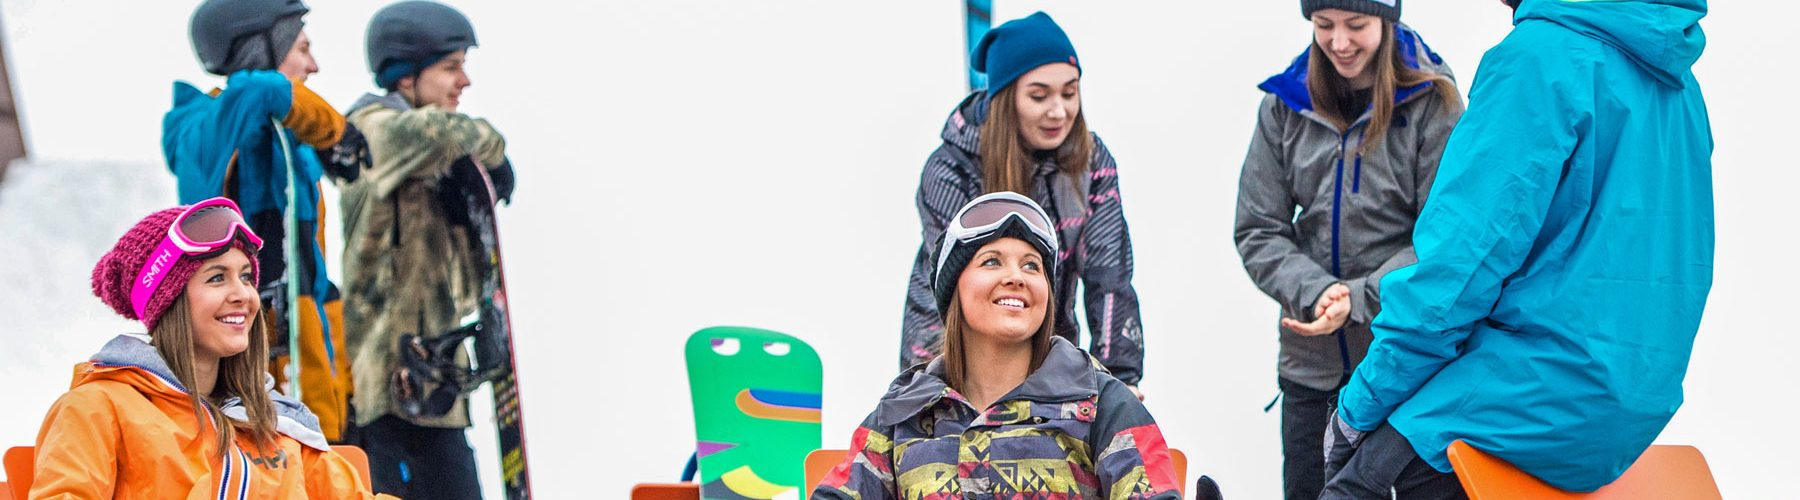 Afton-Alps-skiing-2